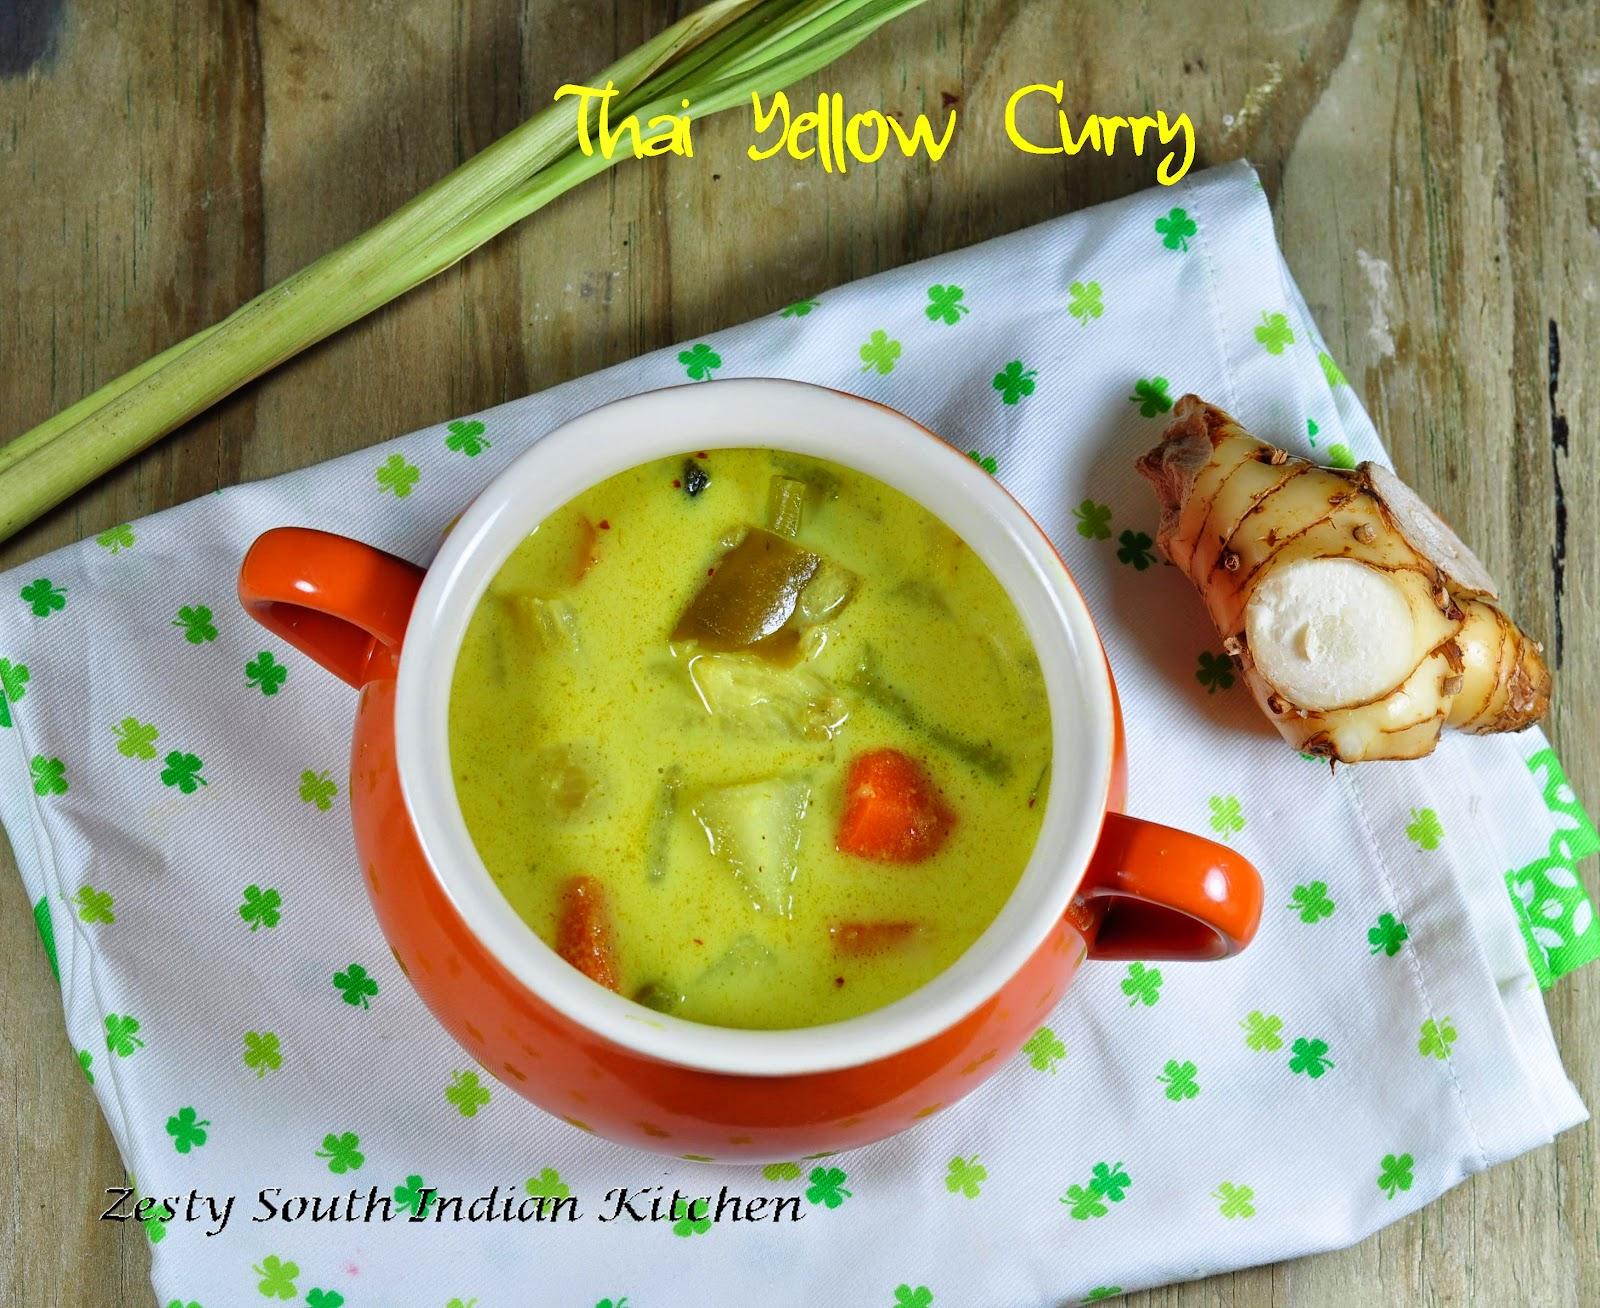 Thai Kitchen Yellow Curry Thai Yellow Curry With Vegetables Kaeng Kari Vegetarian Version